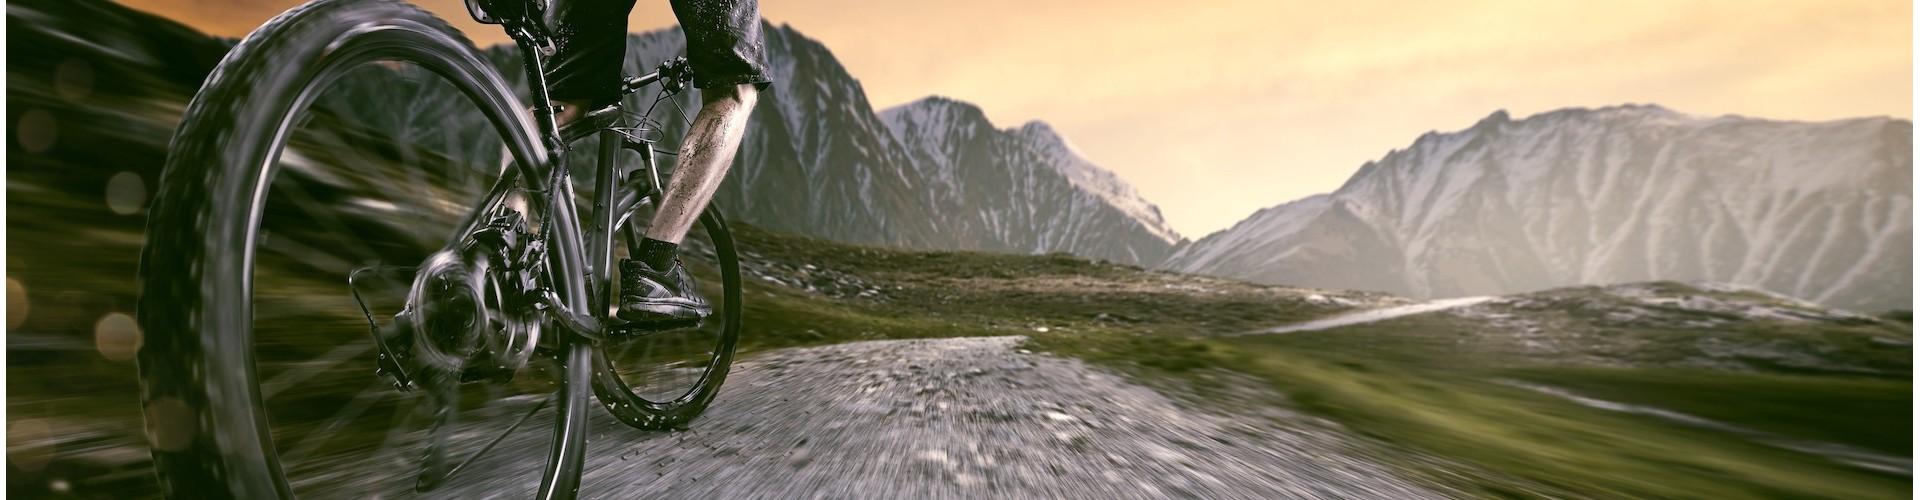 E-Bike Mountain Bikes and Classic Mountain Bikes for sale by E-Bike Toscana near Siena